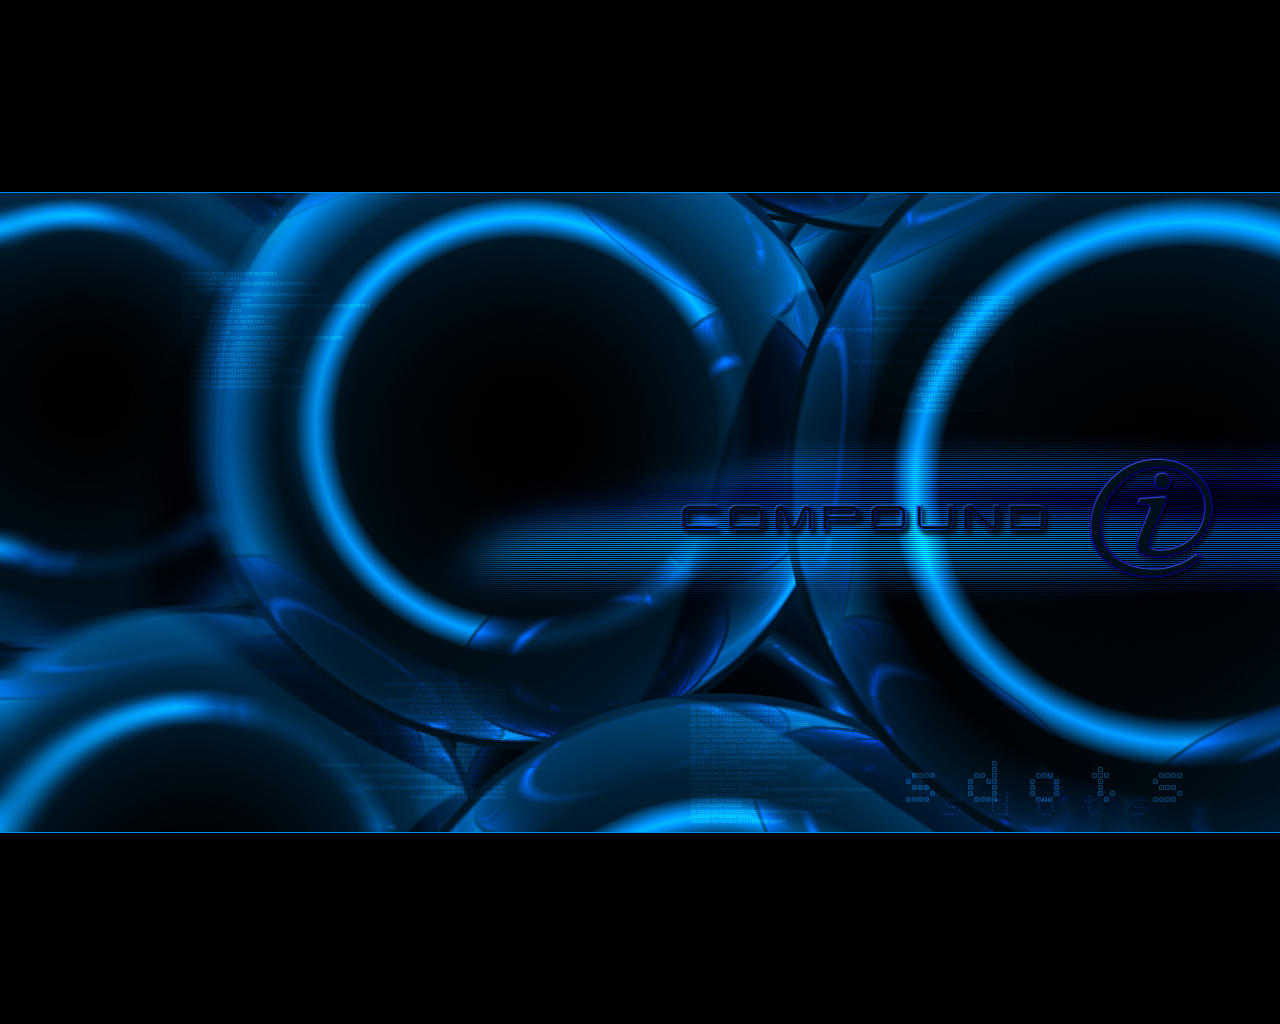 comPoUnd I V3 by sdots